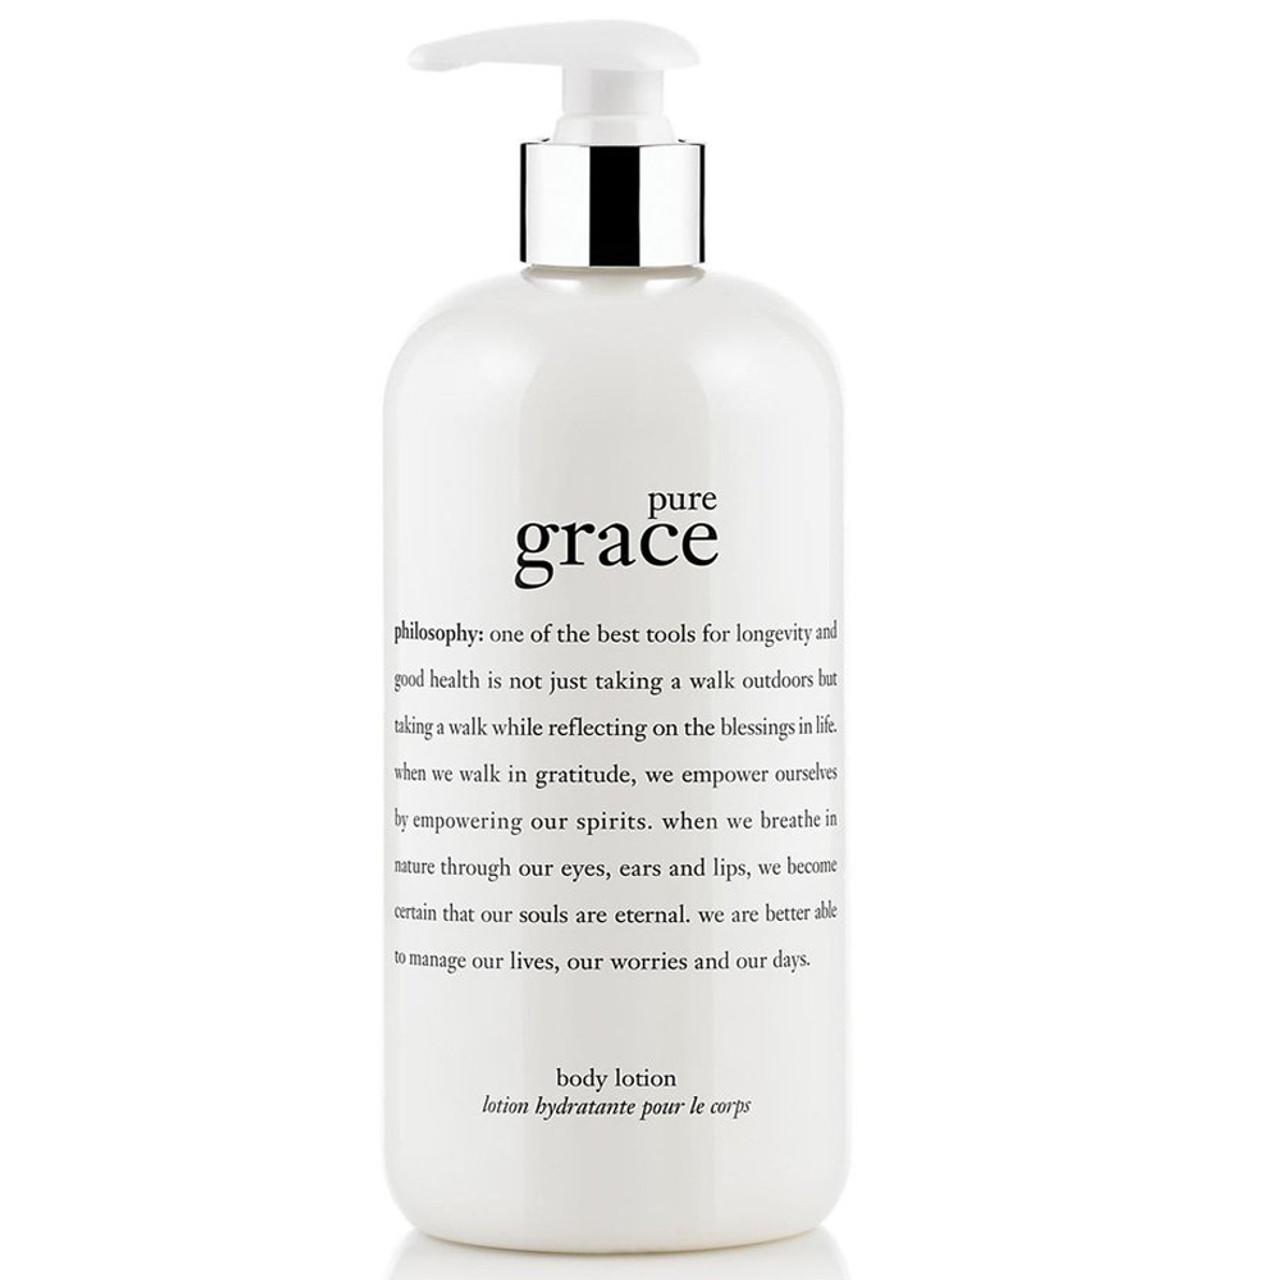 philosophy Pure Grace Body Lotion